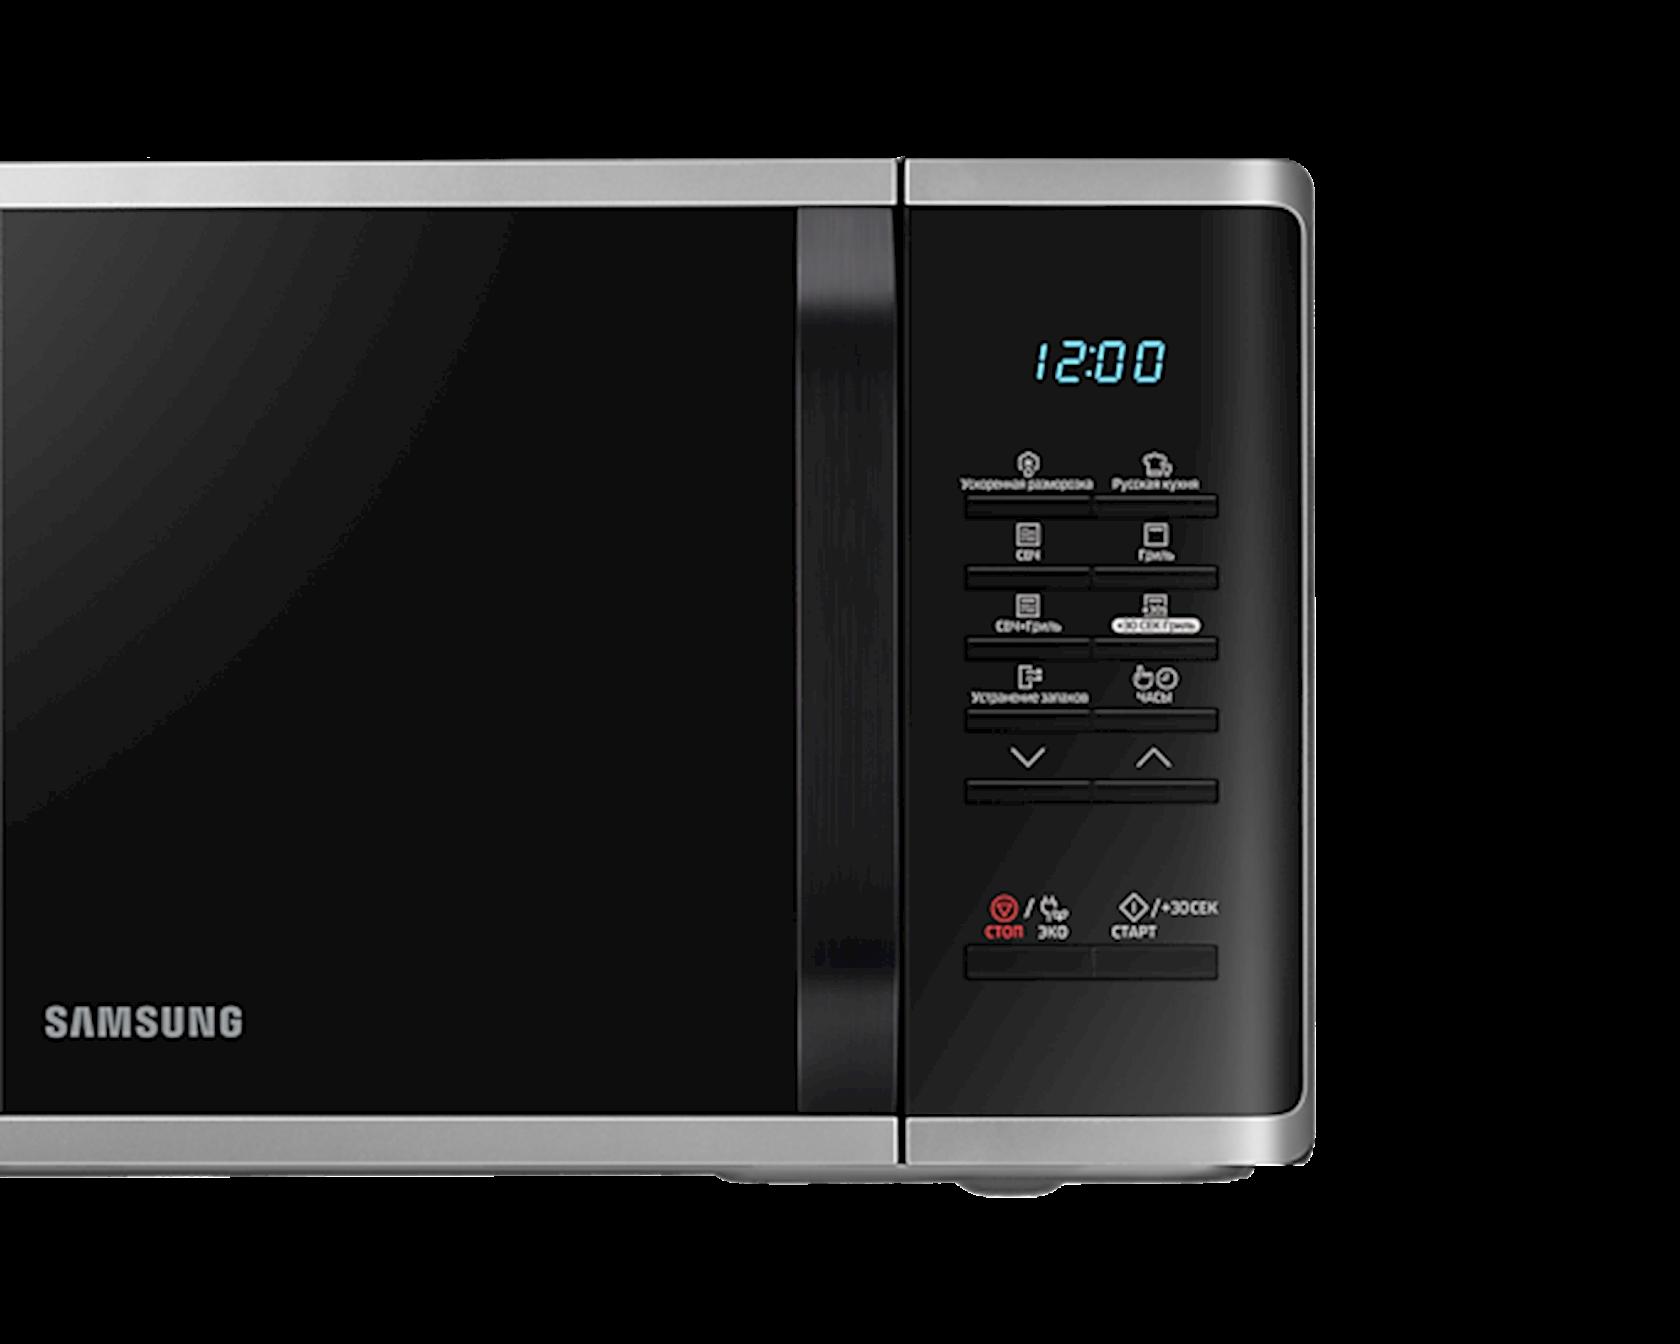 Микроволновая печь Samsung MG23K3513AS / BW